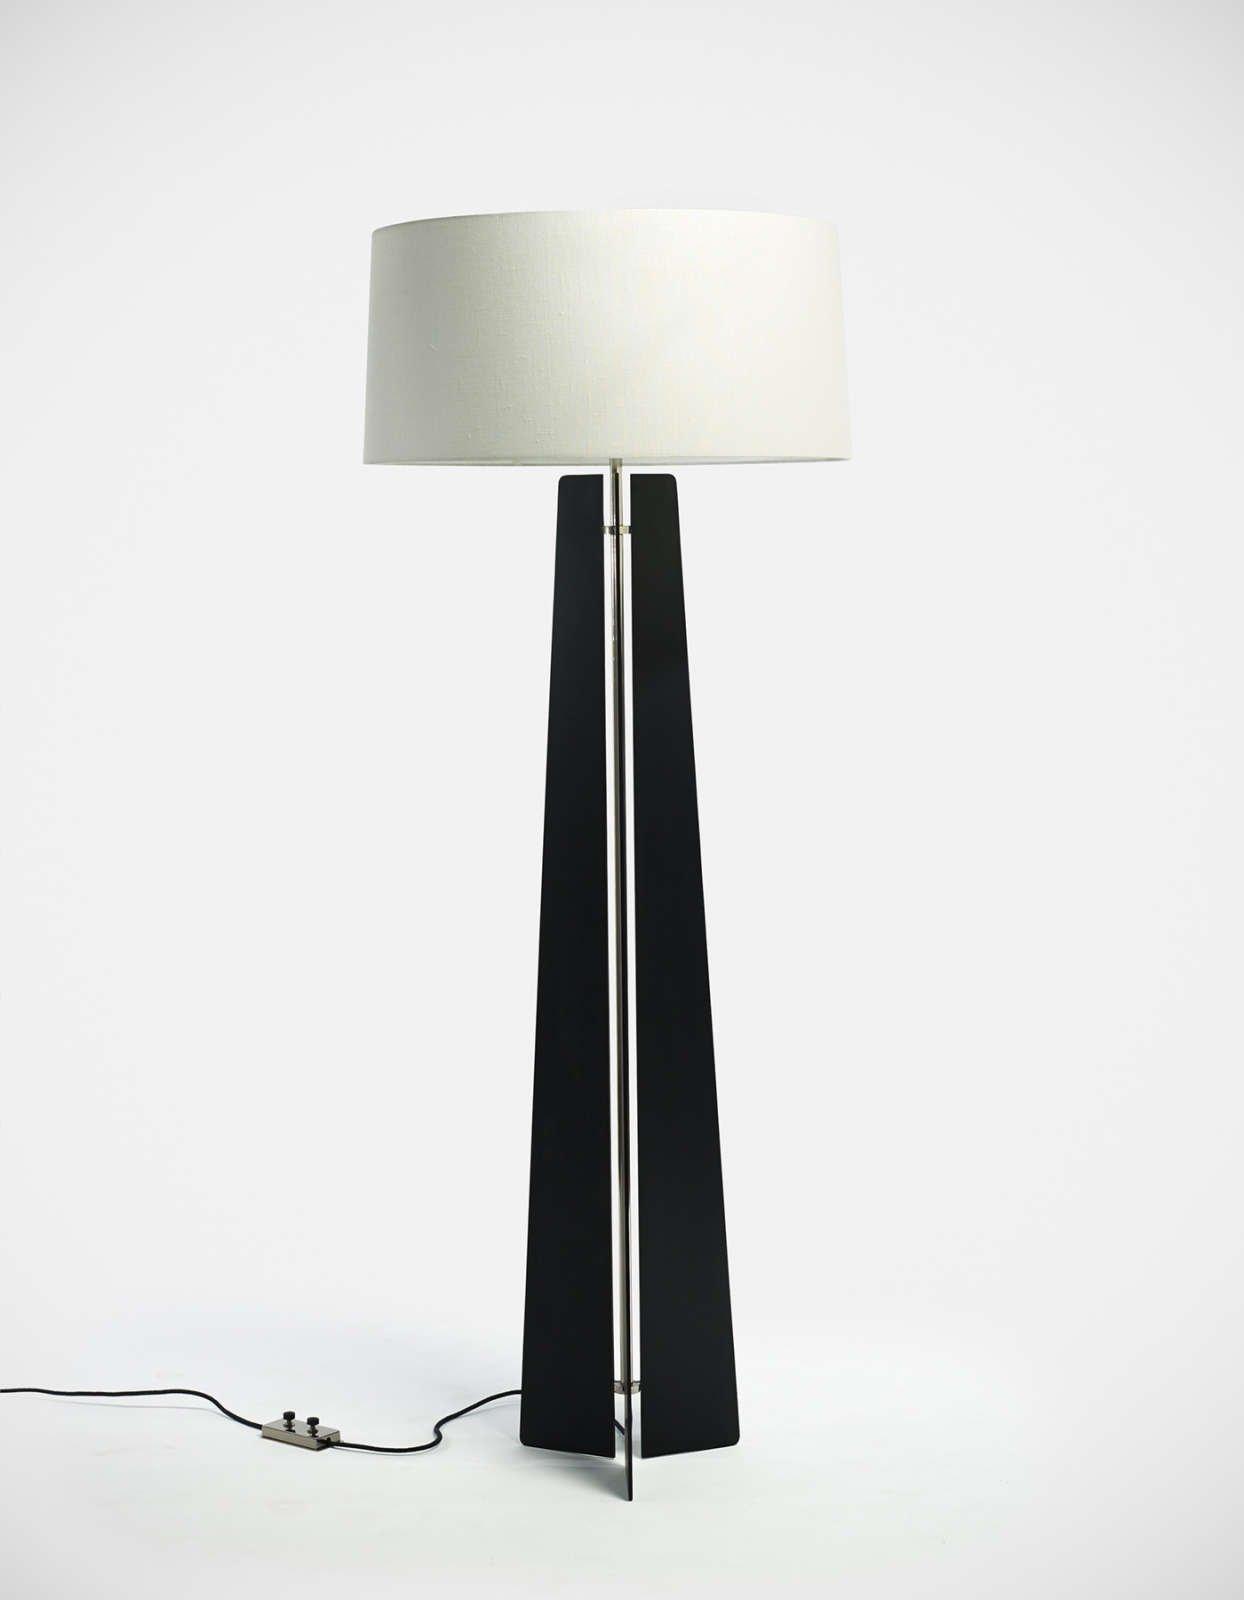 Jonathan Nesci |  Steel floor lamp